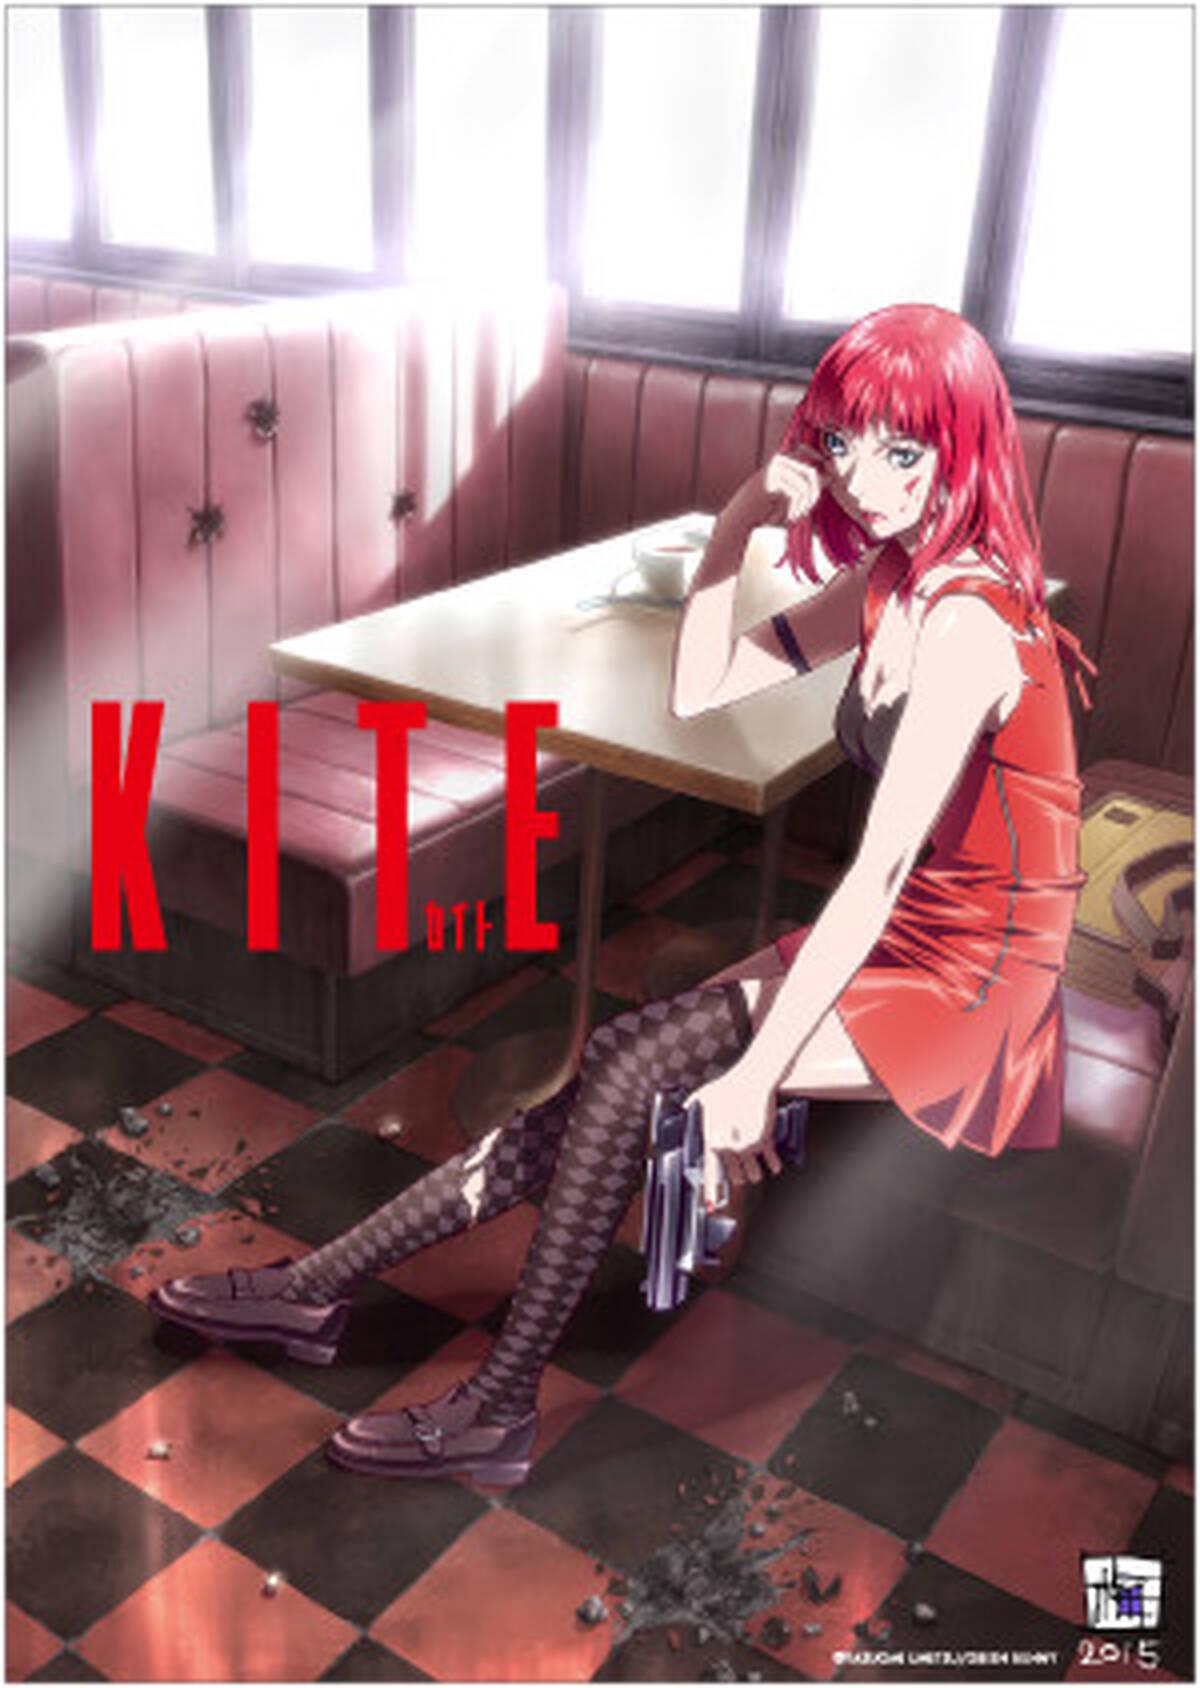 A Kite カイト 梅津泰臣、18禁アニメ「a kite」の描き下ろしイラストを公開